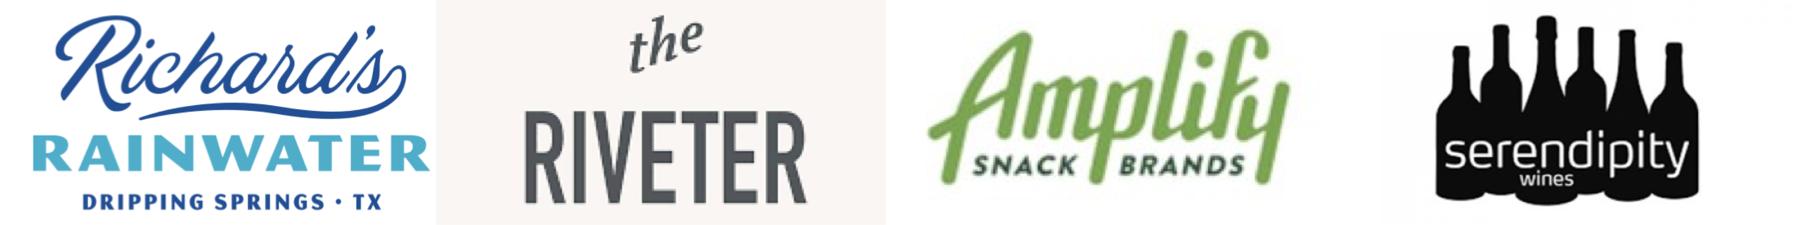 Event sponsors' logos